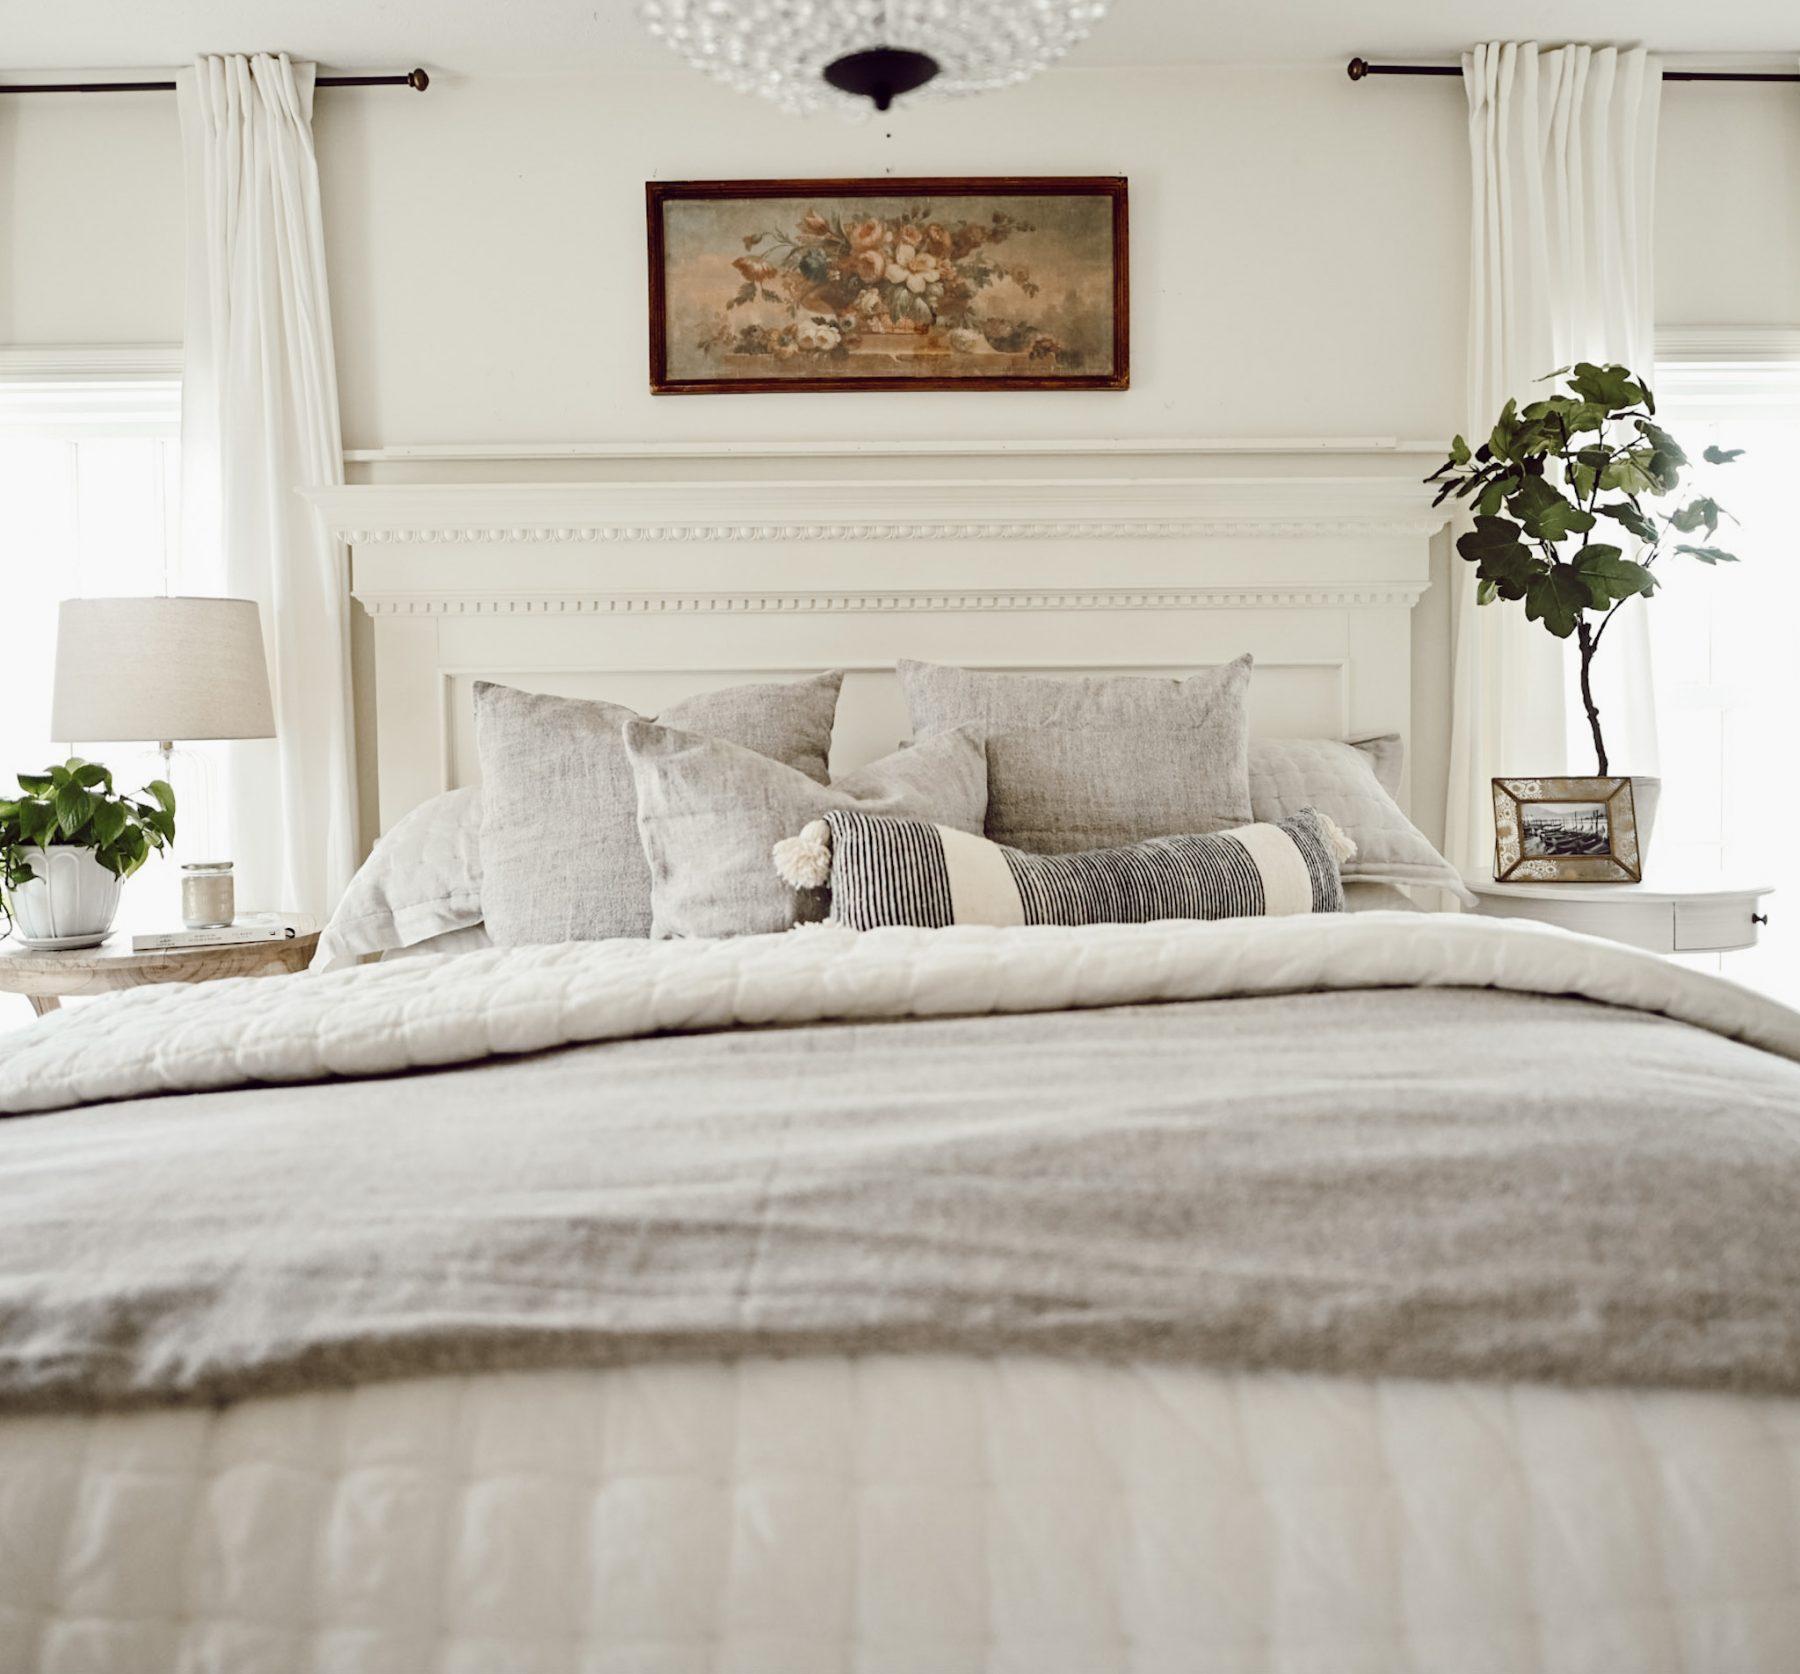 Bedroom Spring Refresh with Anne SELKE